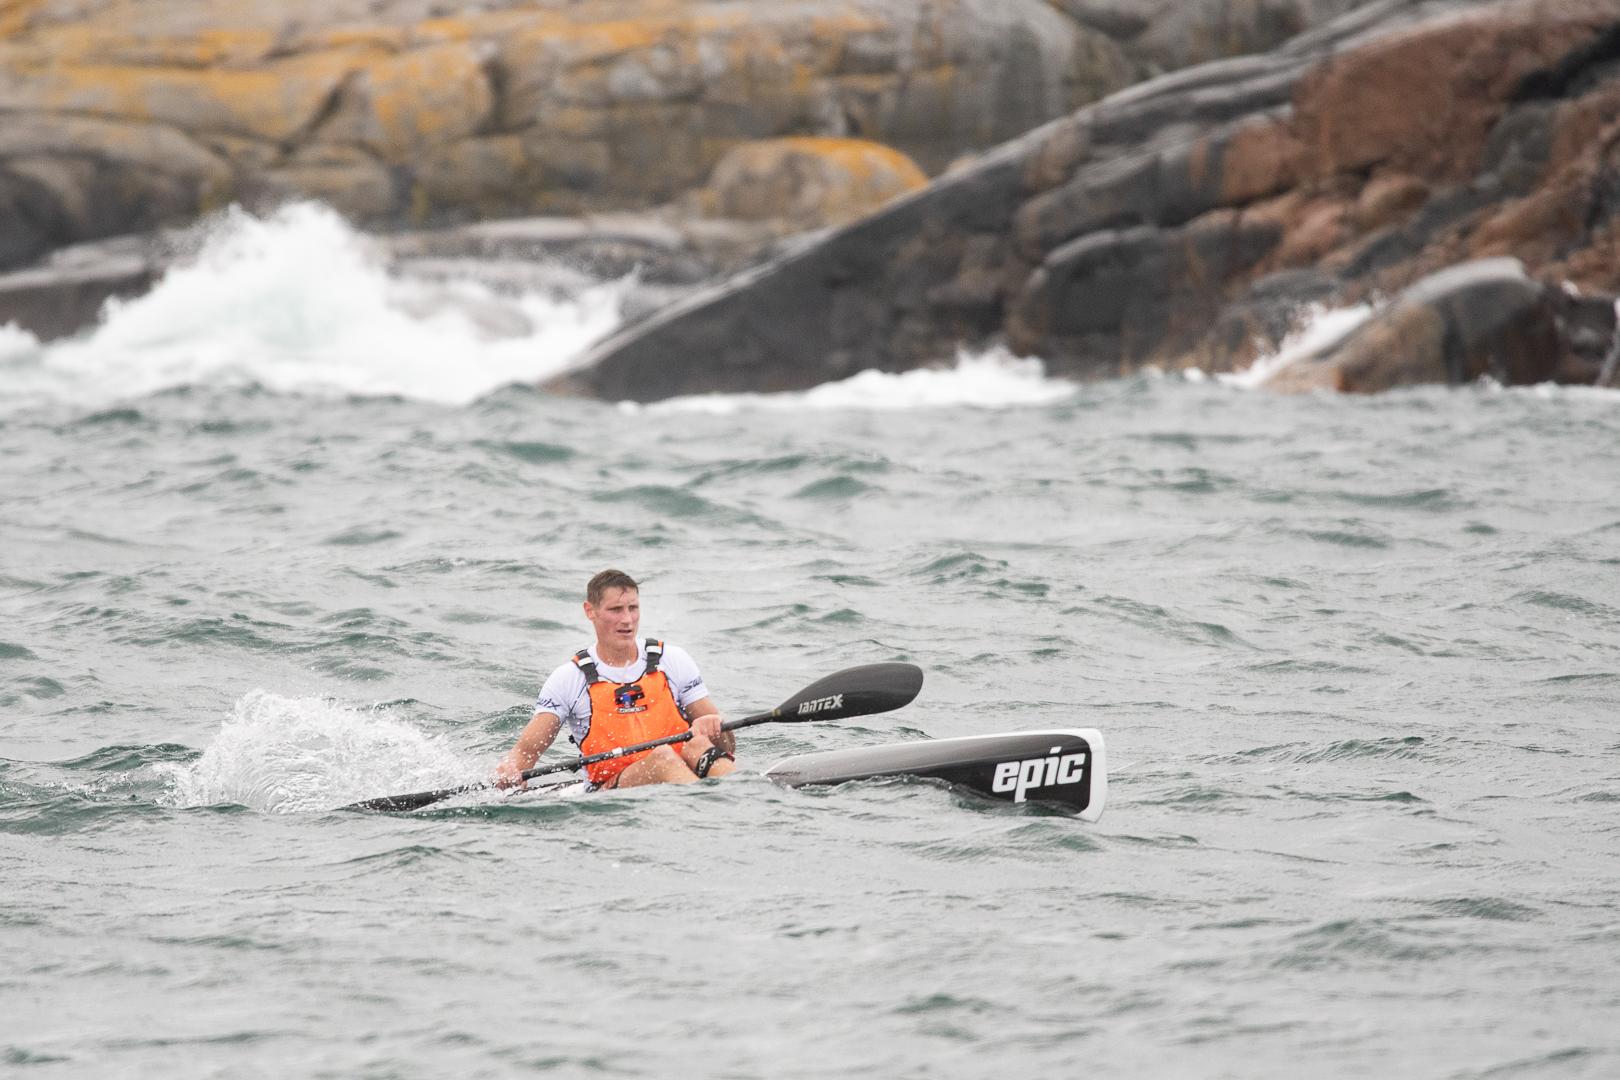 NM Surfski 2019